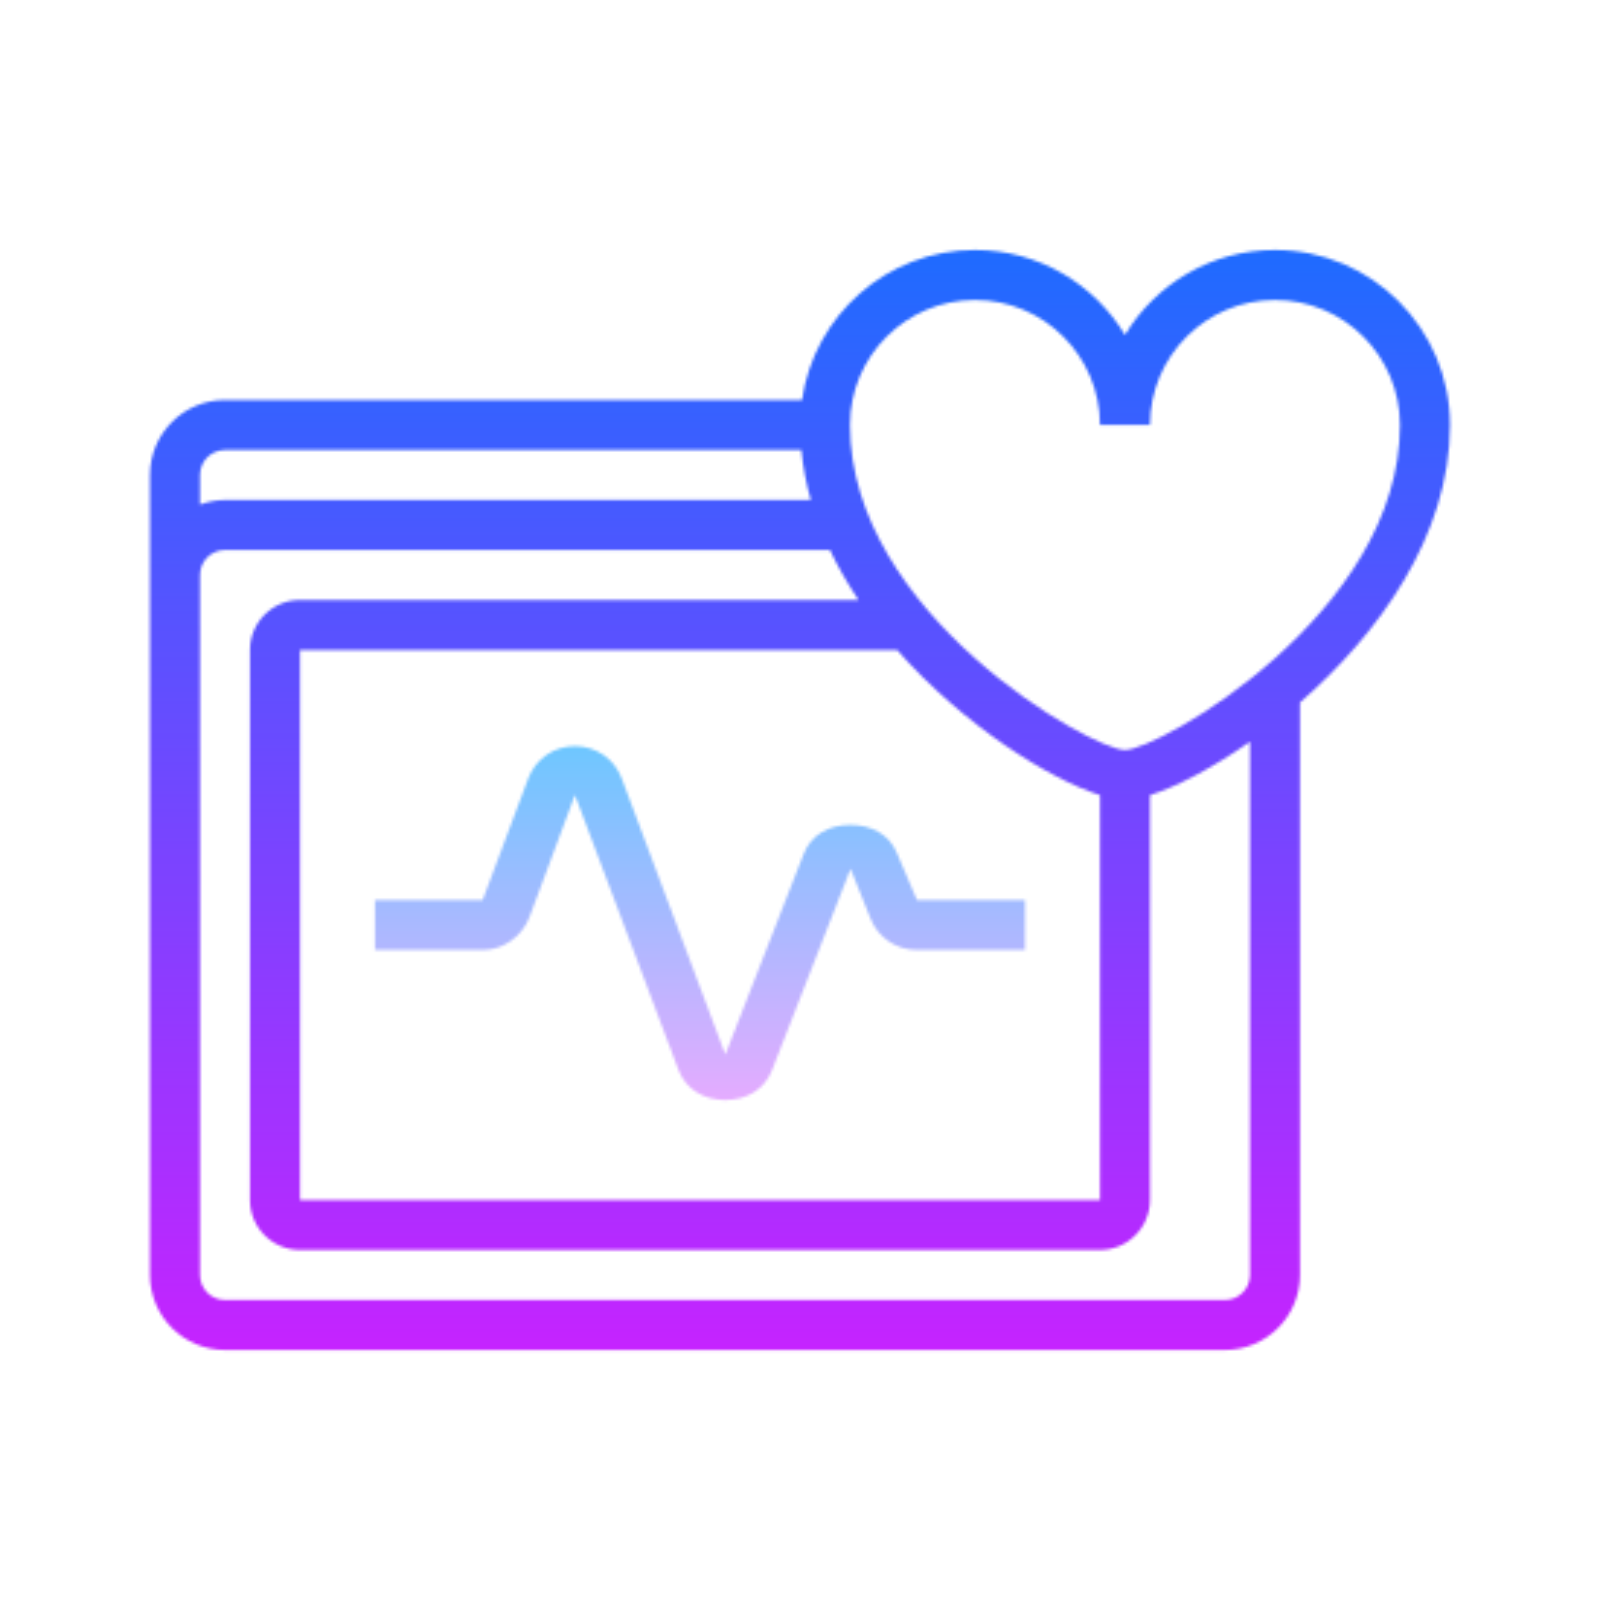 Serce monitora icon